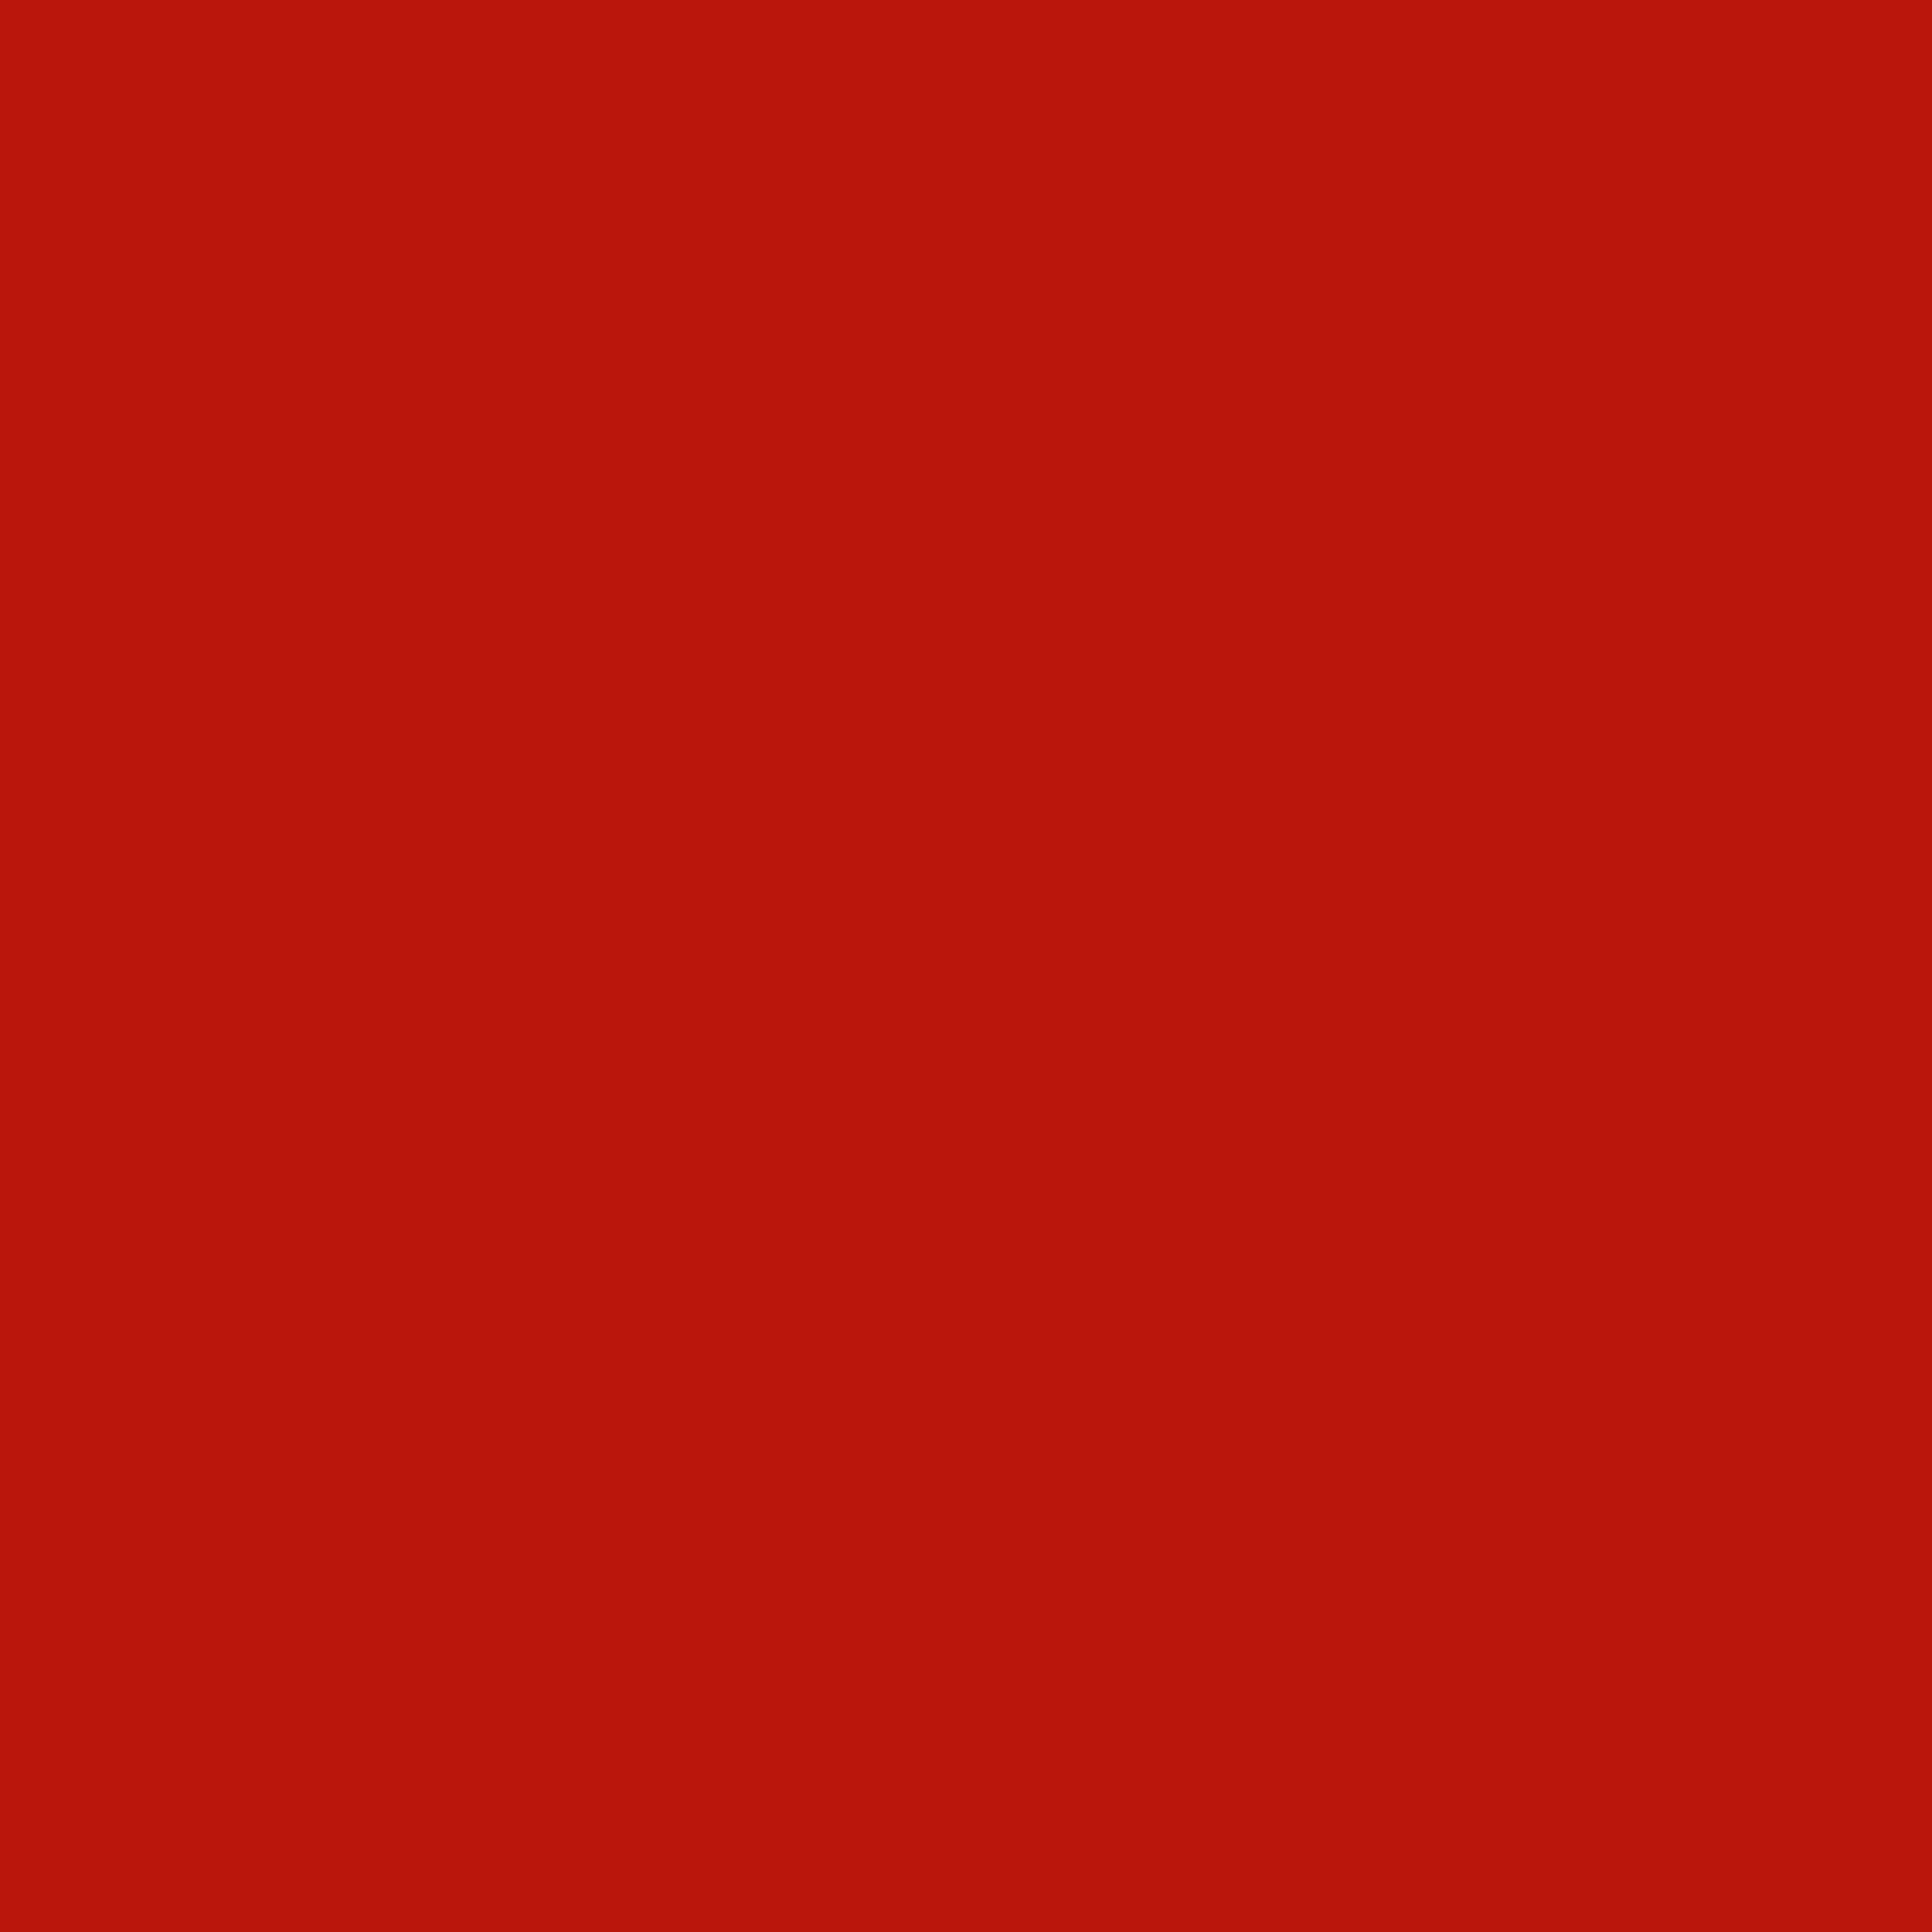 2732x2732 International Orange Engineering Solid Color Background